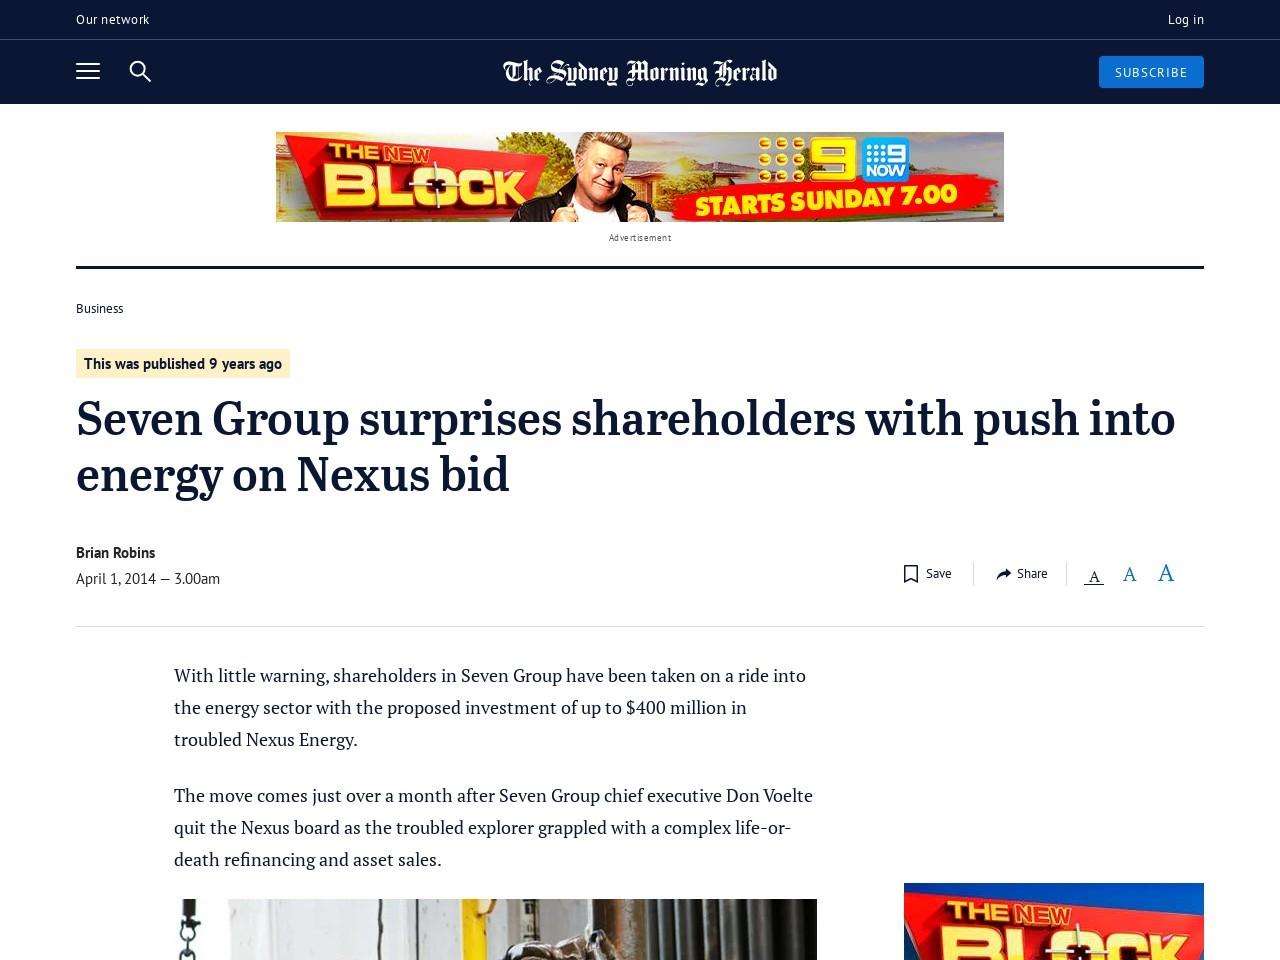 Seven Group surprises shareholders with push into energy on Nexus bid